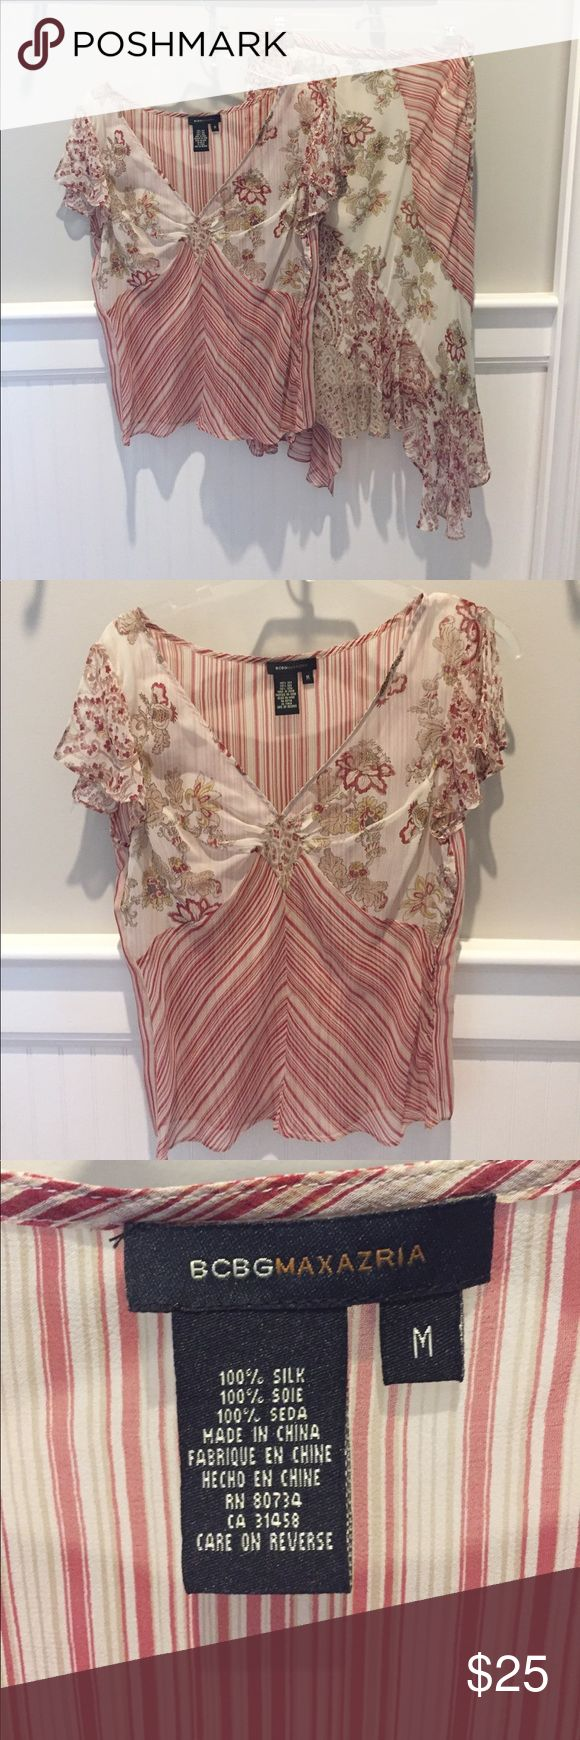 BCBG Maxazria skirt set BCBG Maxazria Skirt zest 100% Silk top size M side closure 100% Silk skirt inside lining is polyester size 6 BCBGMaxAzria Skirts Skirt Sets